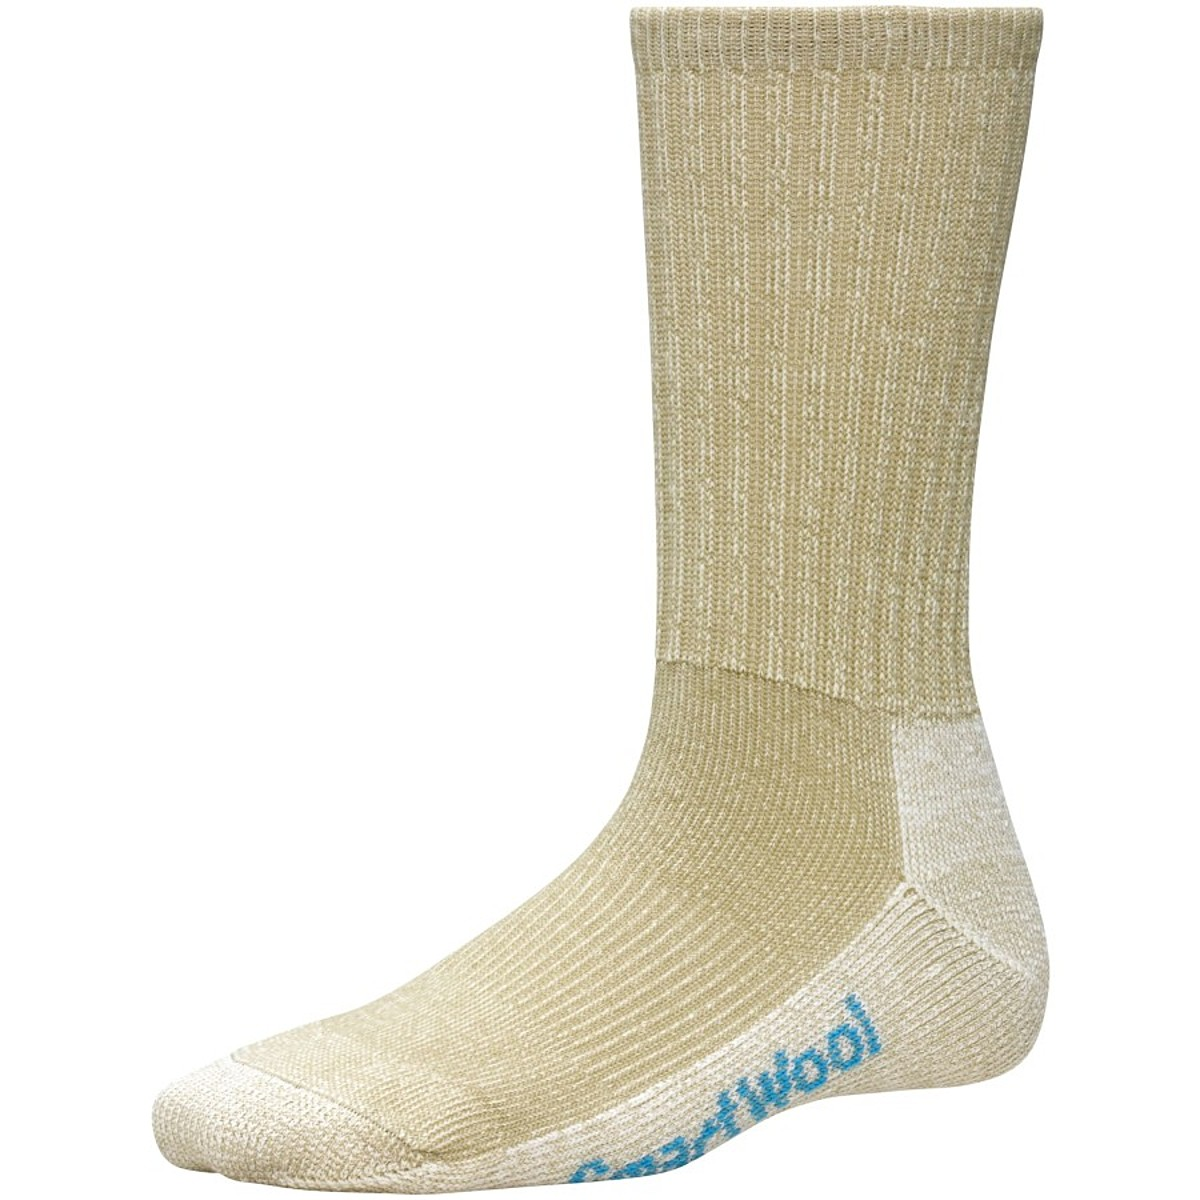 Smartwool Hiking Light Crew Sock